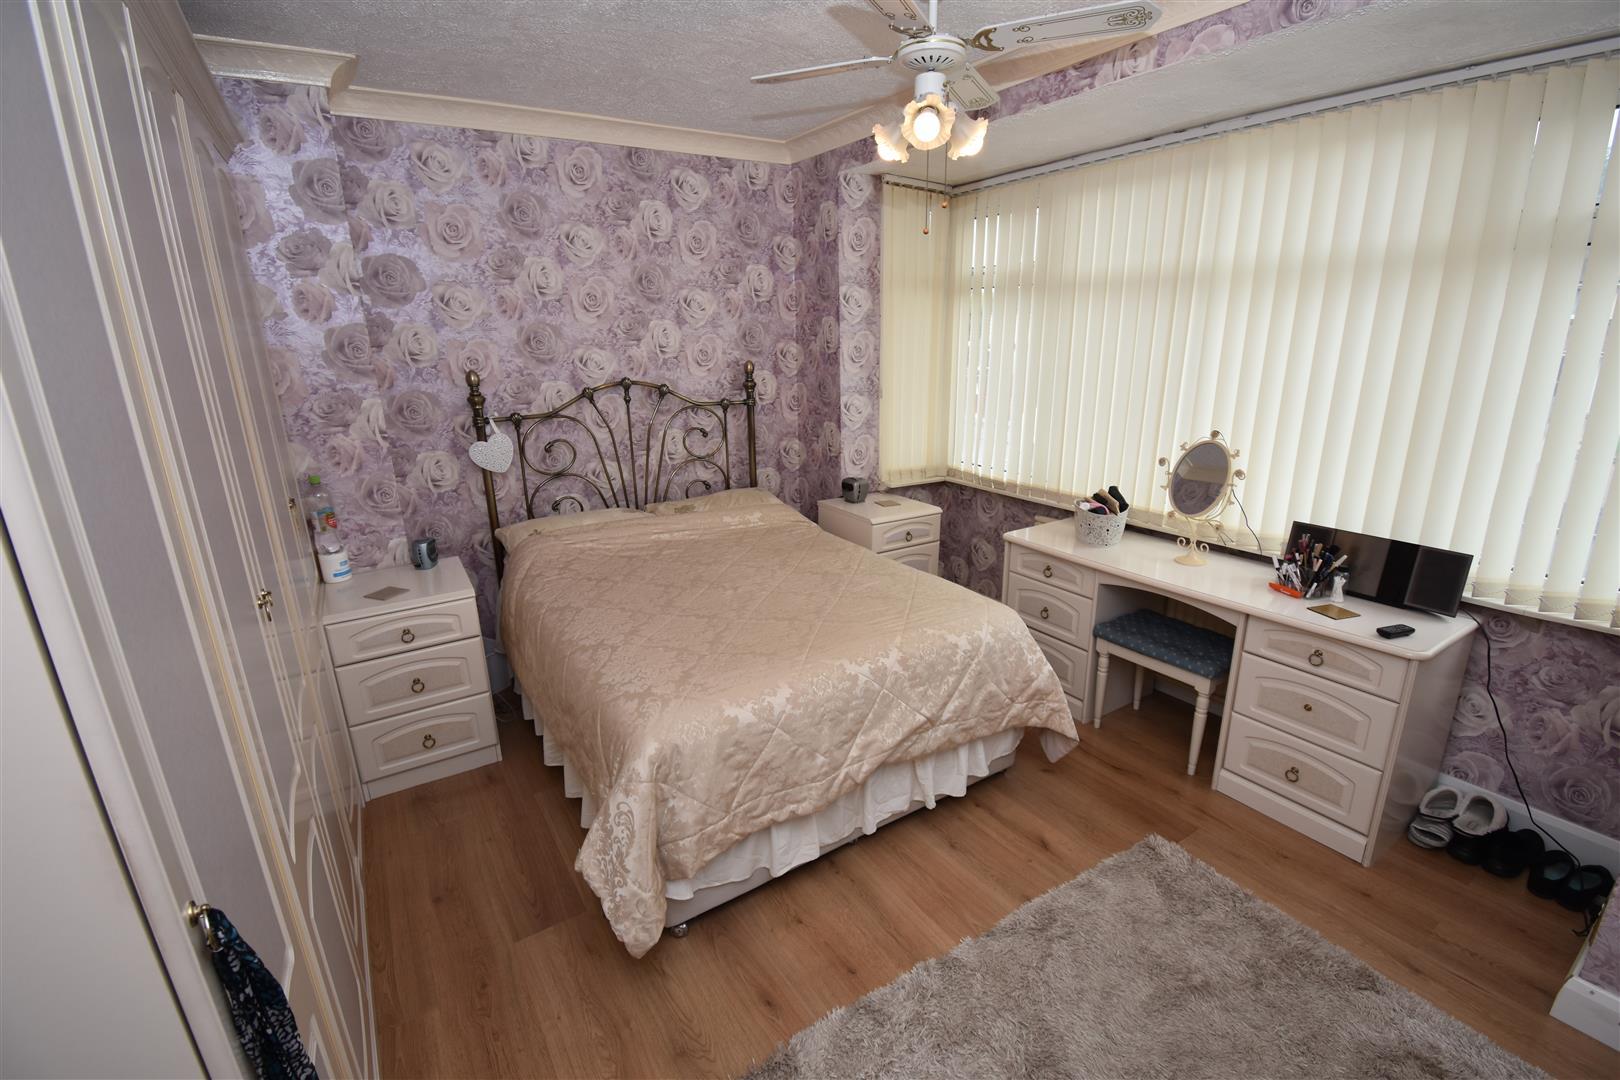 3 bed house for sale in Drews Lane, Birmingham B8 2SL 9